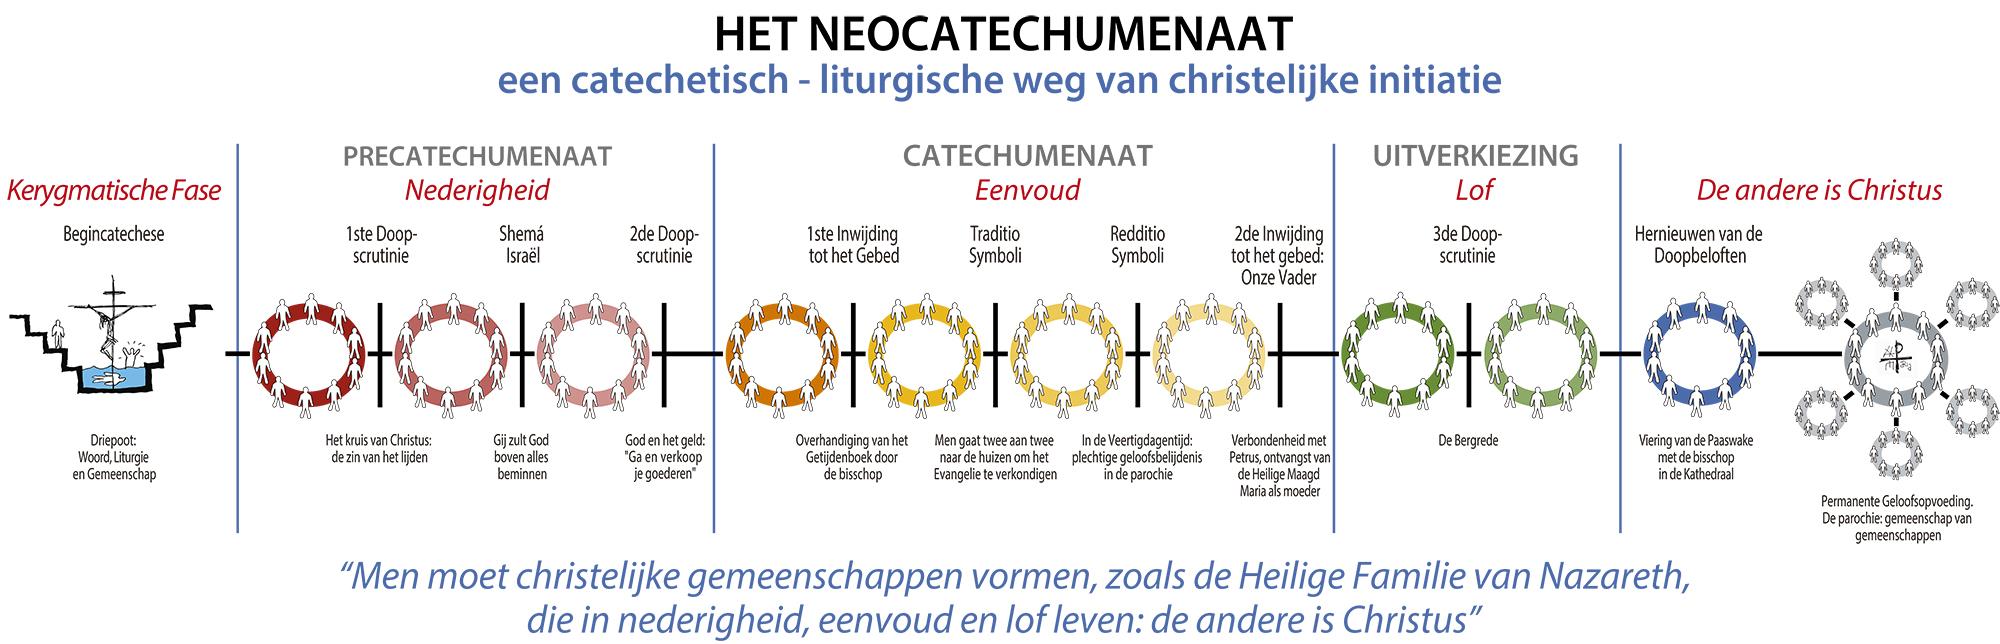 Etappes van de Neocatechumenale Weg